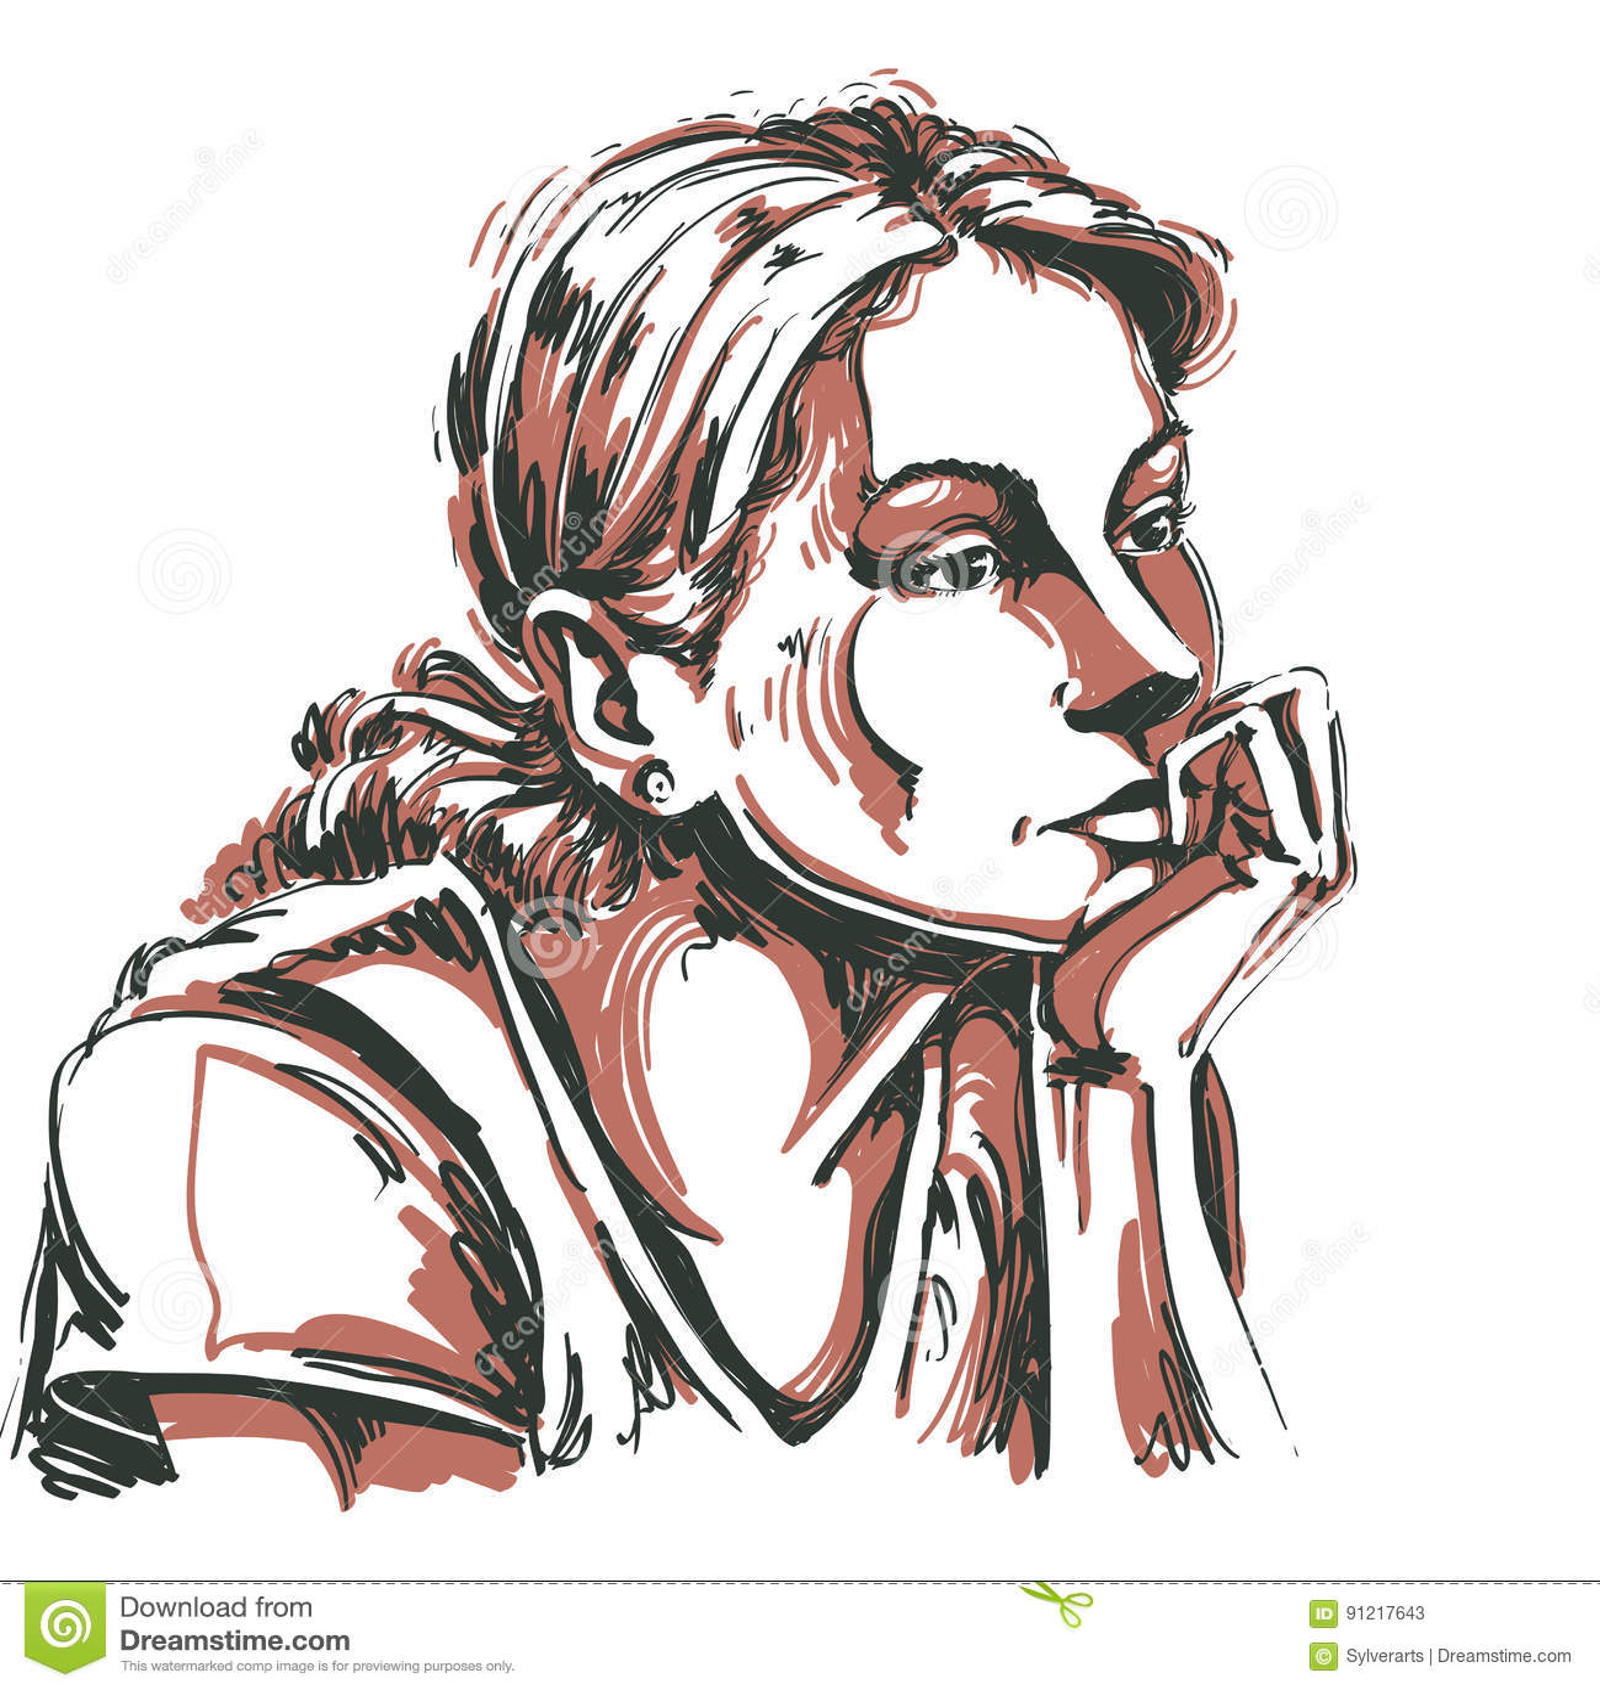 Artistiek hand-drawn vectorbeeld, portret van gevoelige melanchol